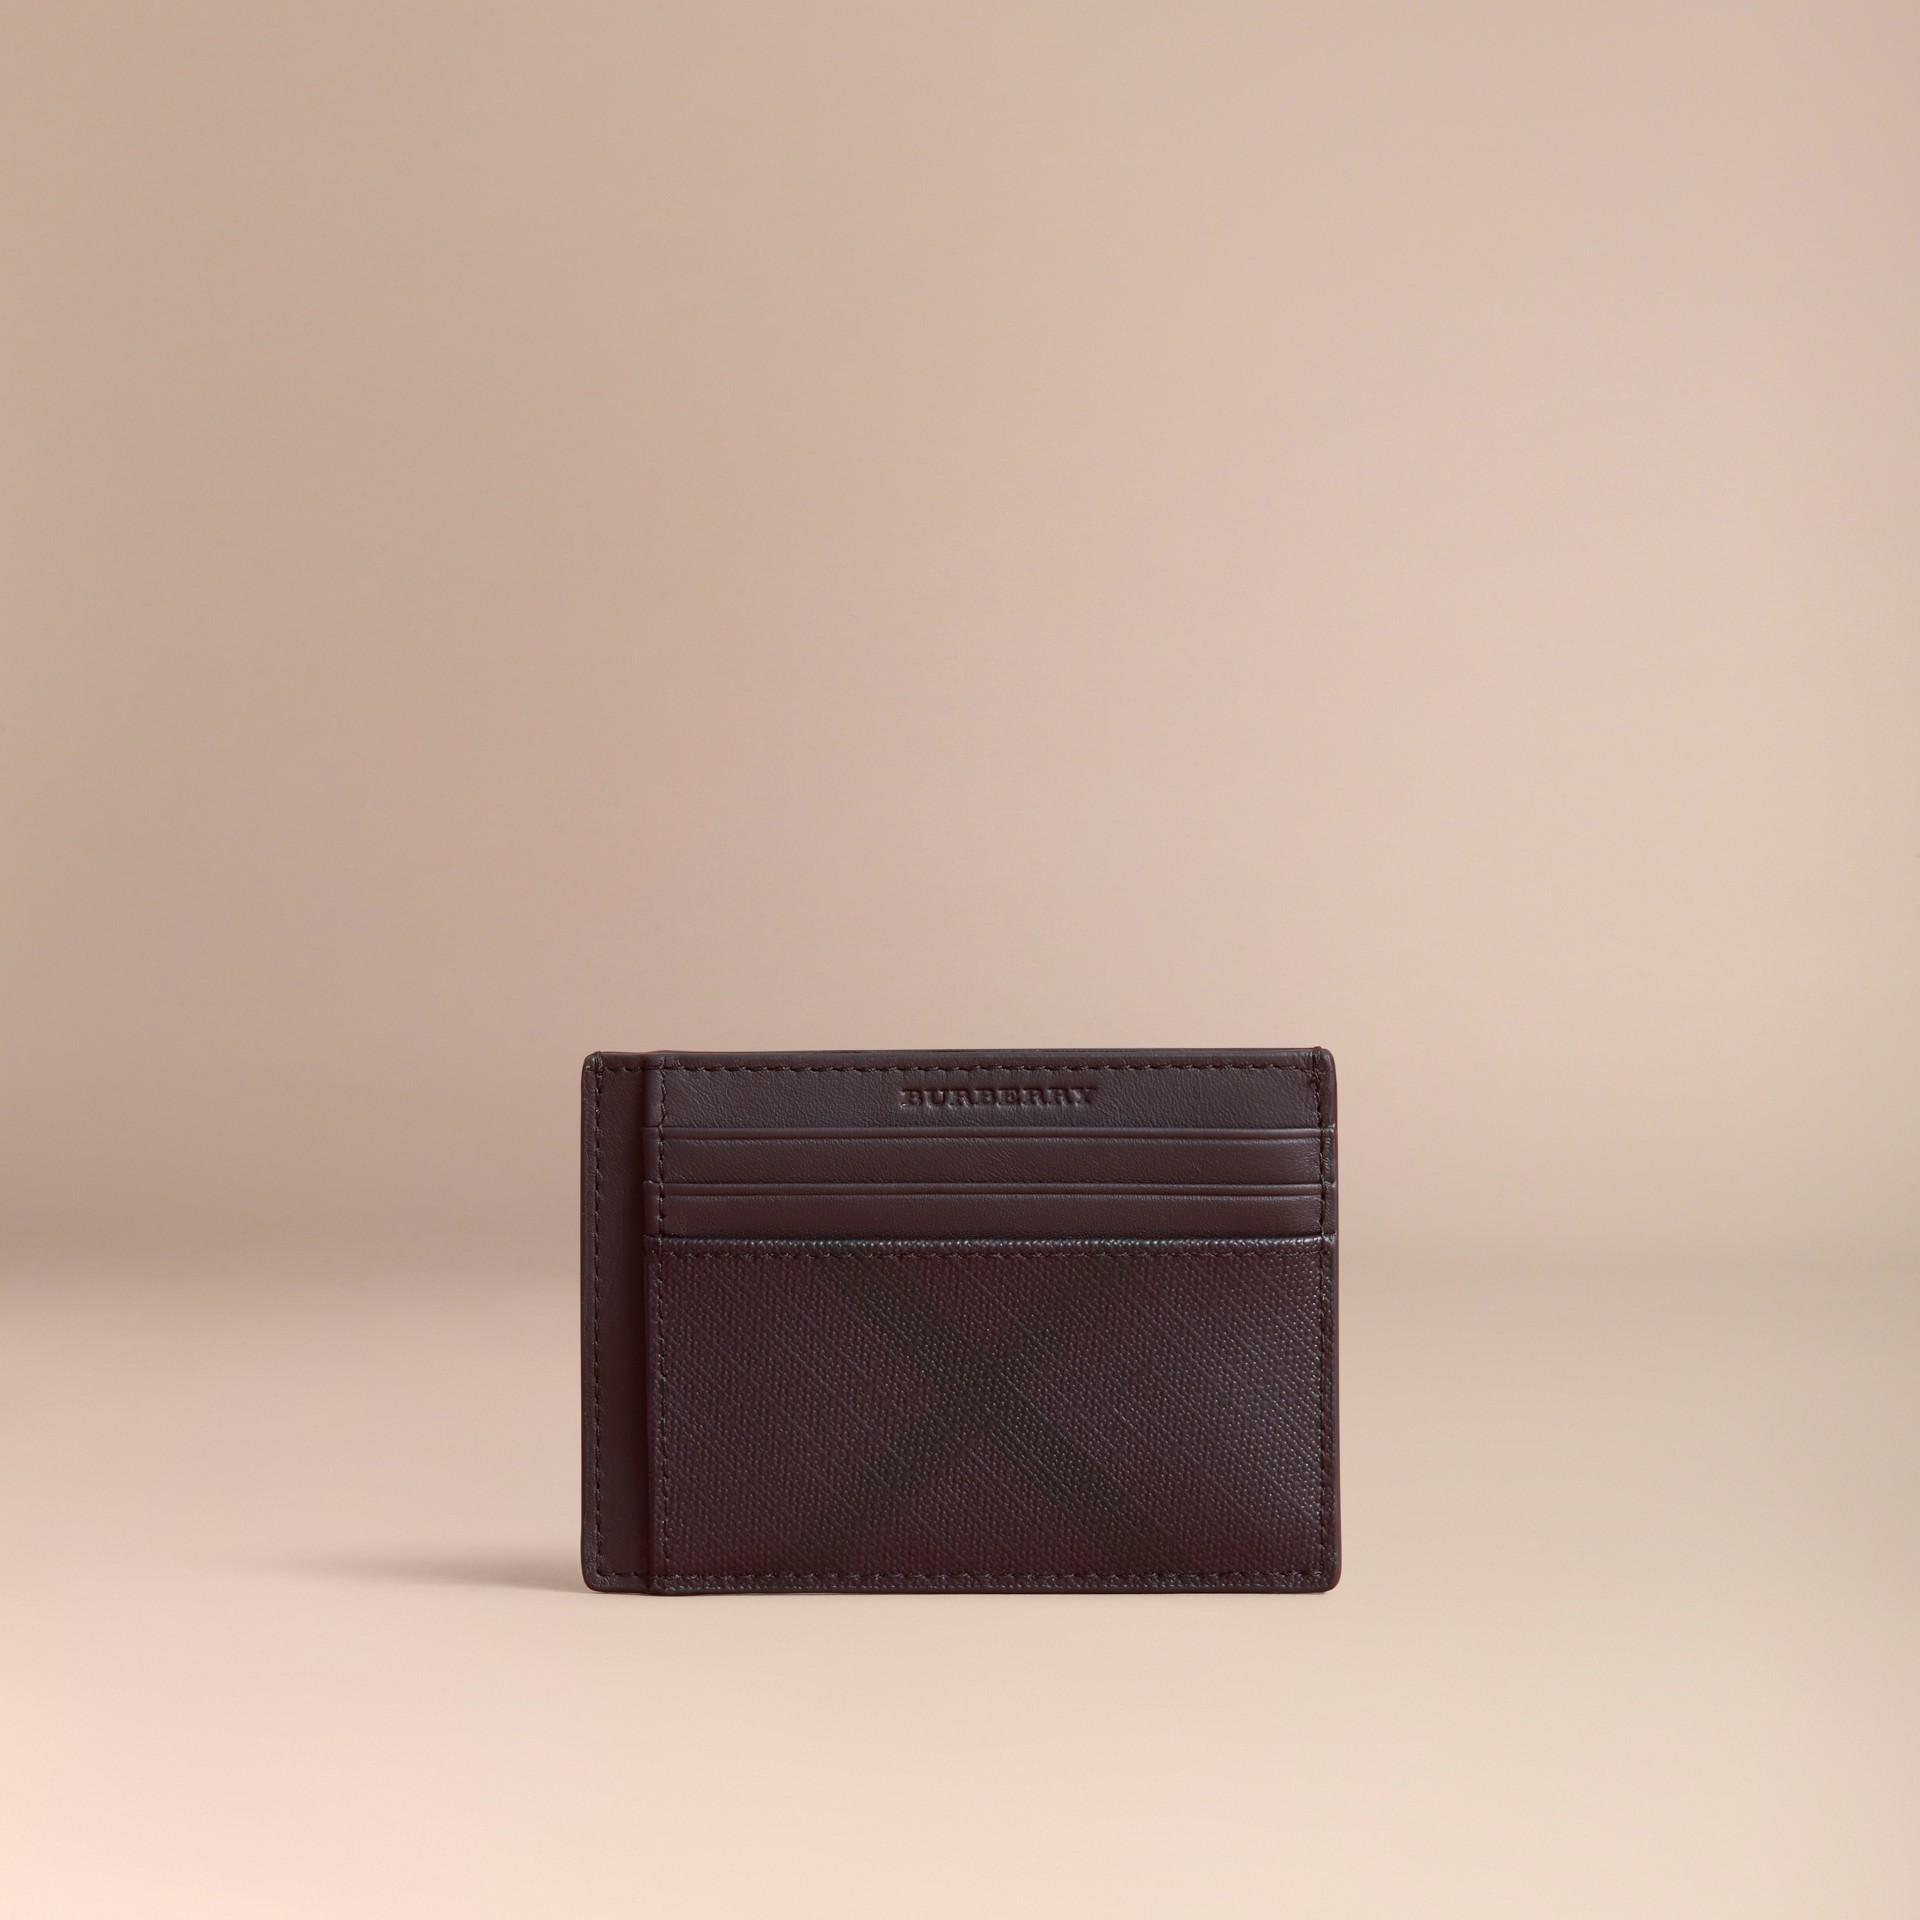 London Check Money Clip Card Case in Deep Claret - Men | Burberry - gallery image 5